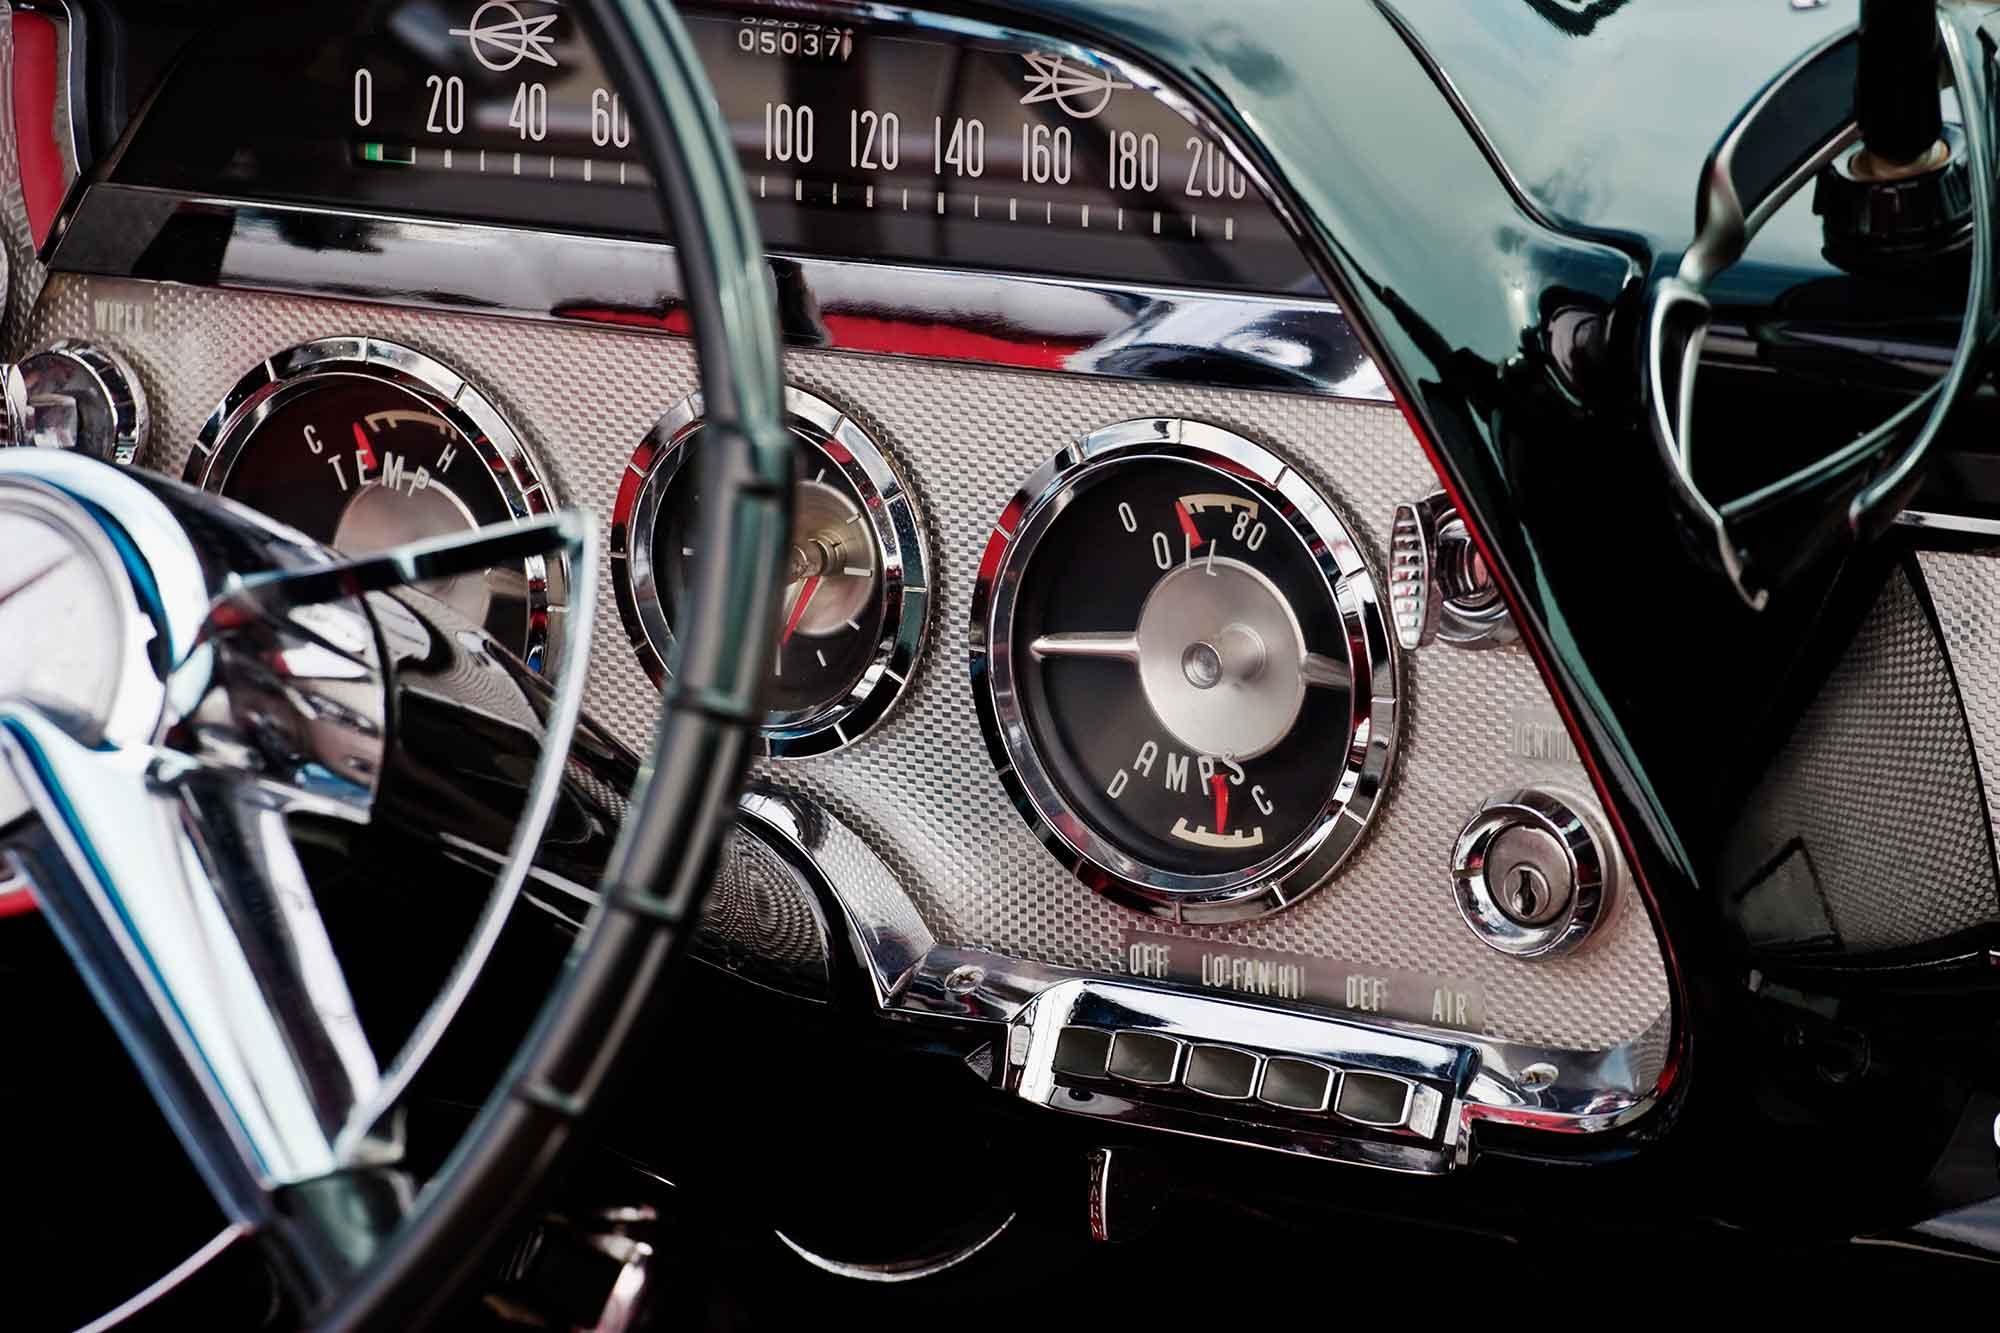 SelectClassicCars.com - Classic Cars For Sale - Hiram GA Dealer